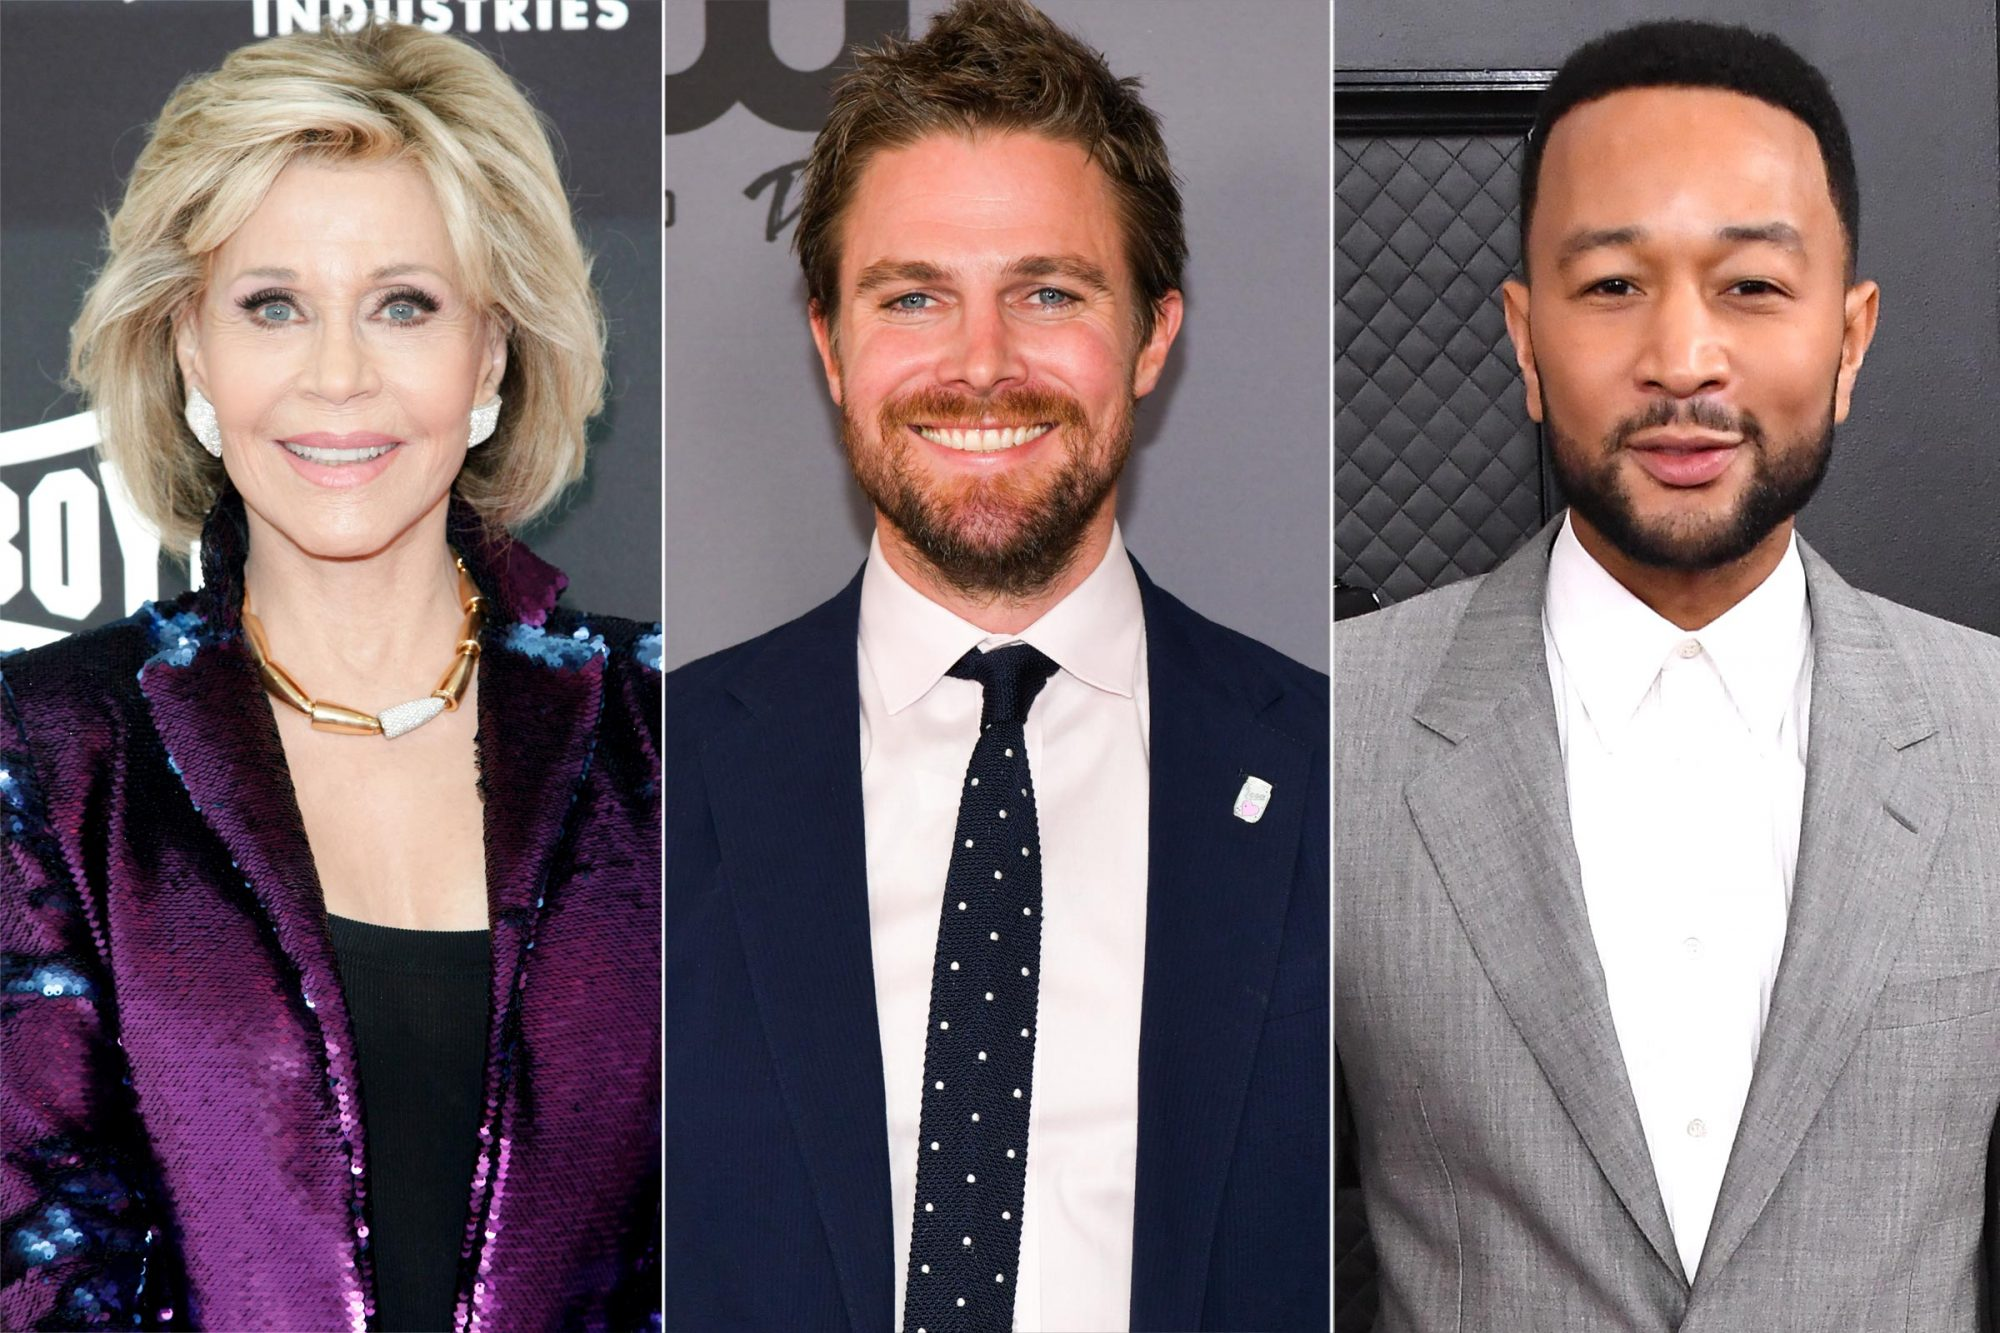 Jane Fonda, Stephen Amell, John Legend